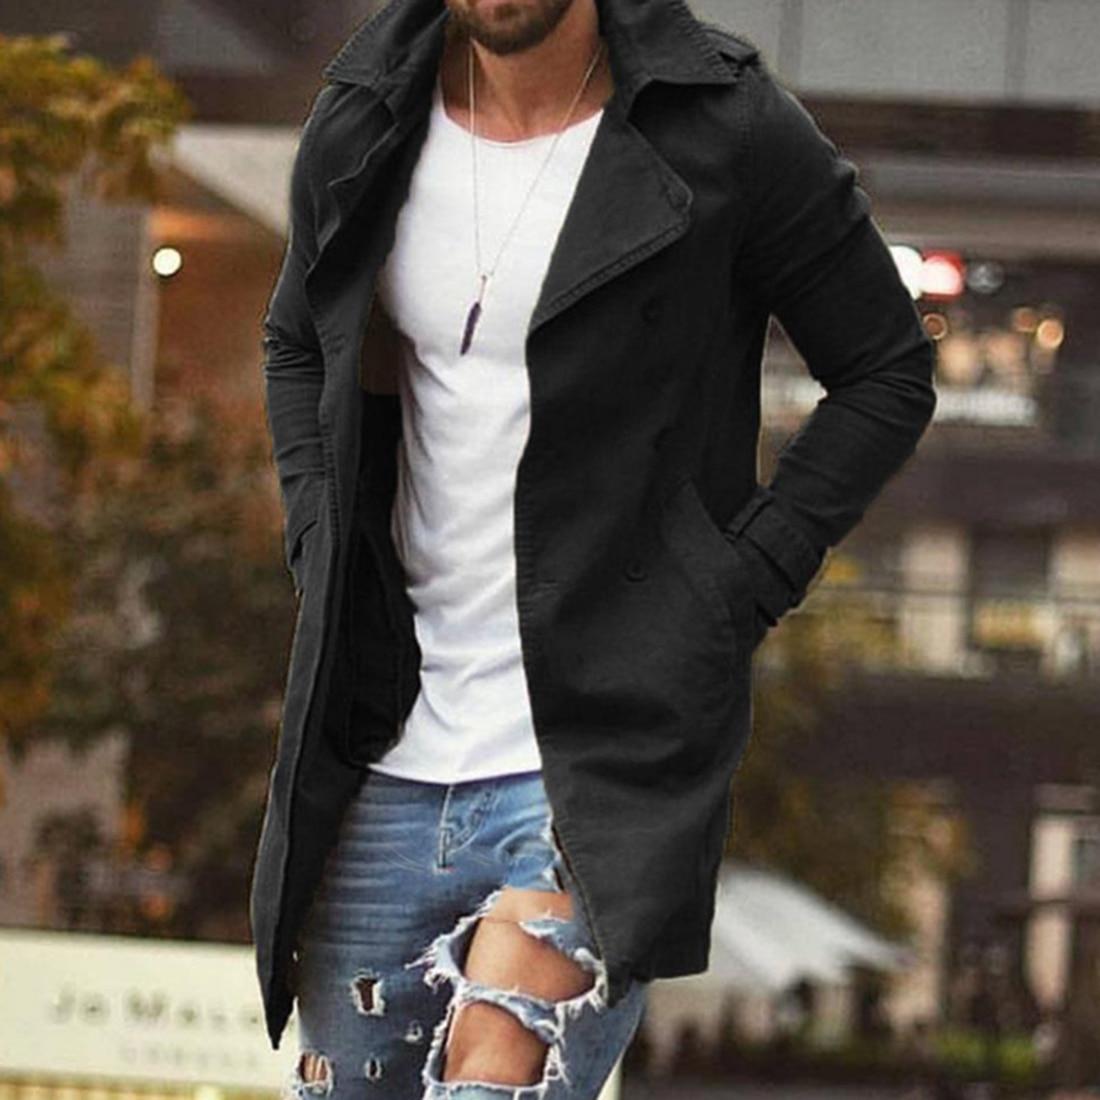 Spring Autumn Men Trench Coat Jacket Slim Fit Plus Size Black Outwear Business Long Windproof Overcoat Jackets For Men 2